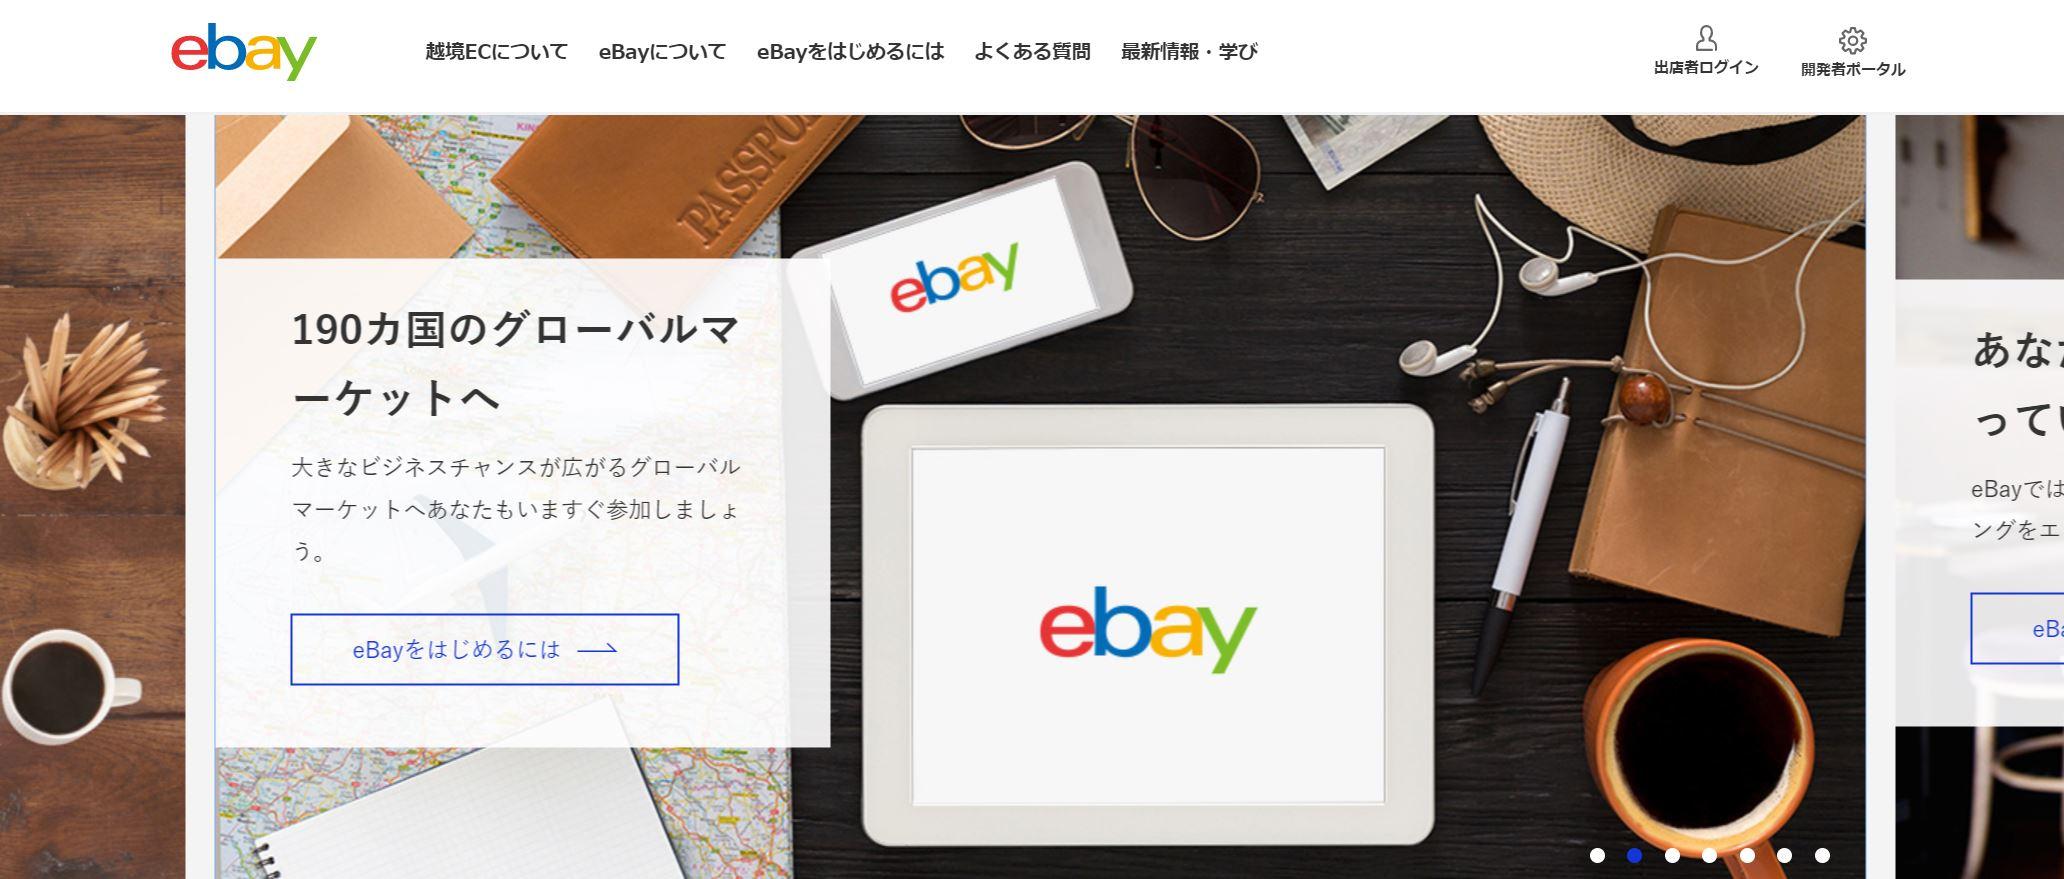 eBayのトップページ